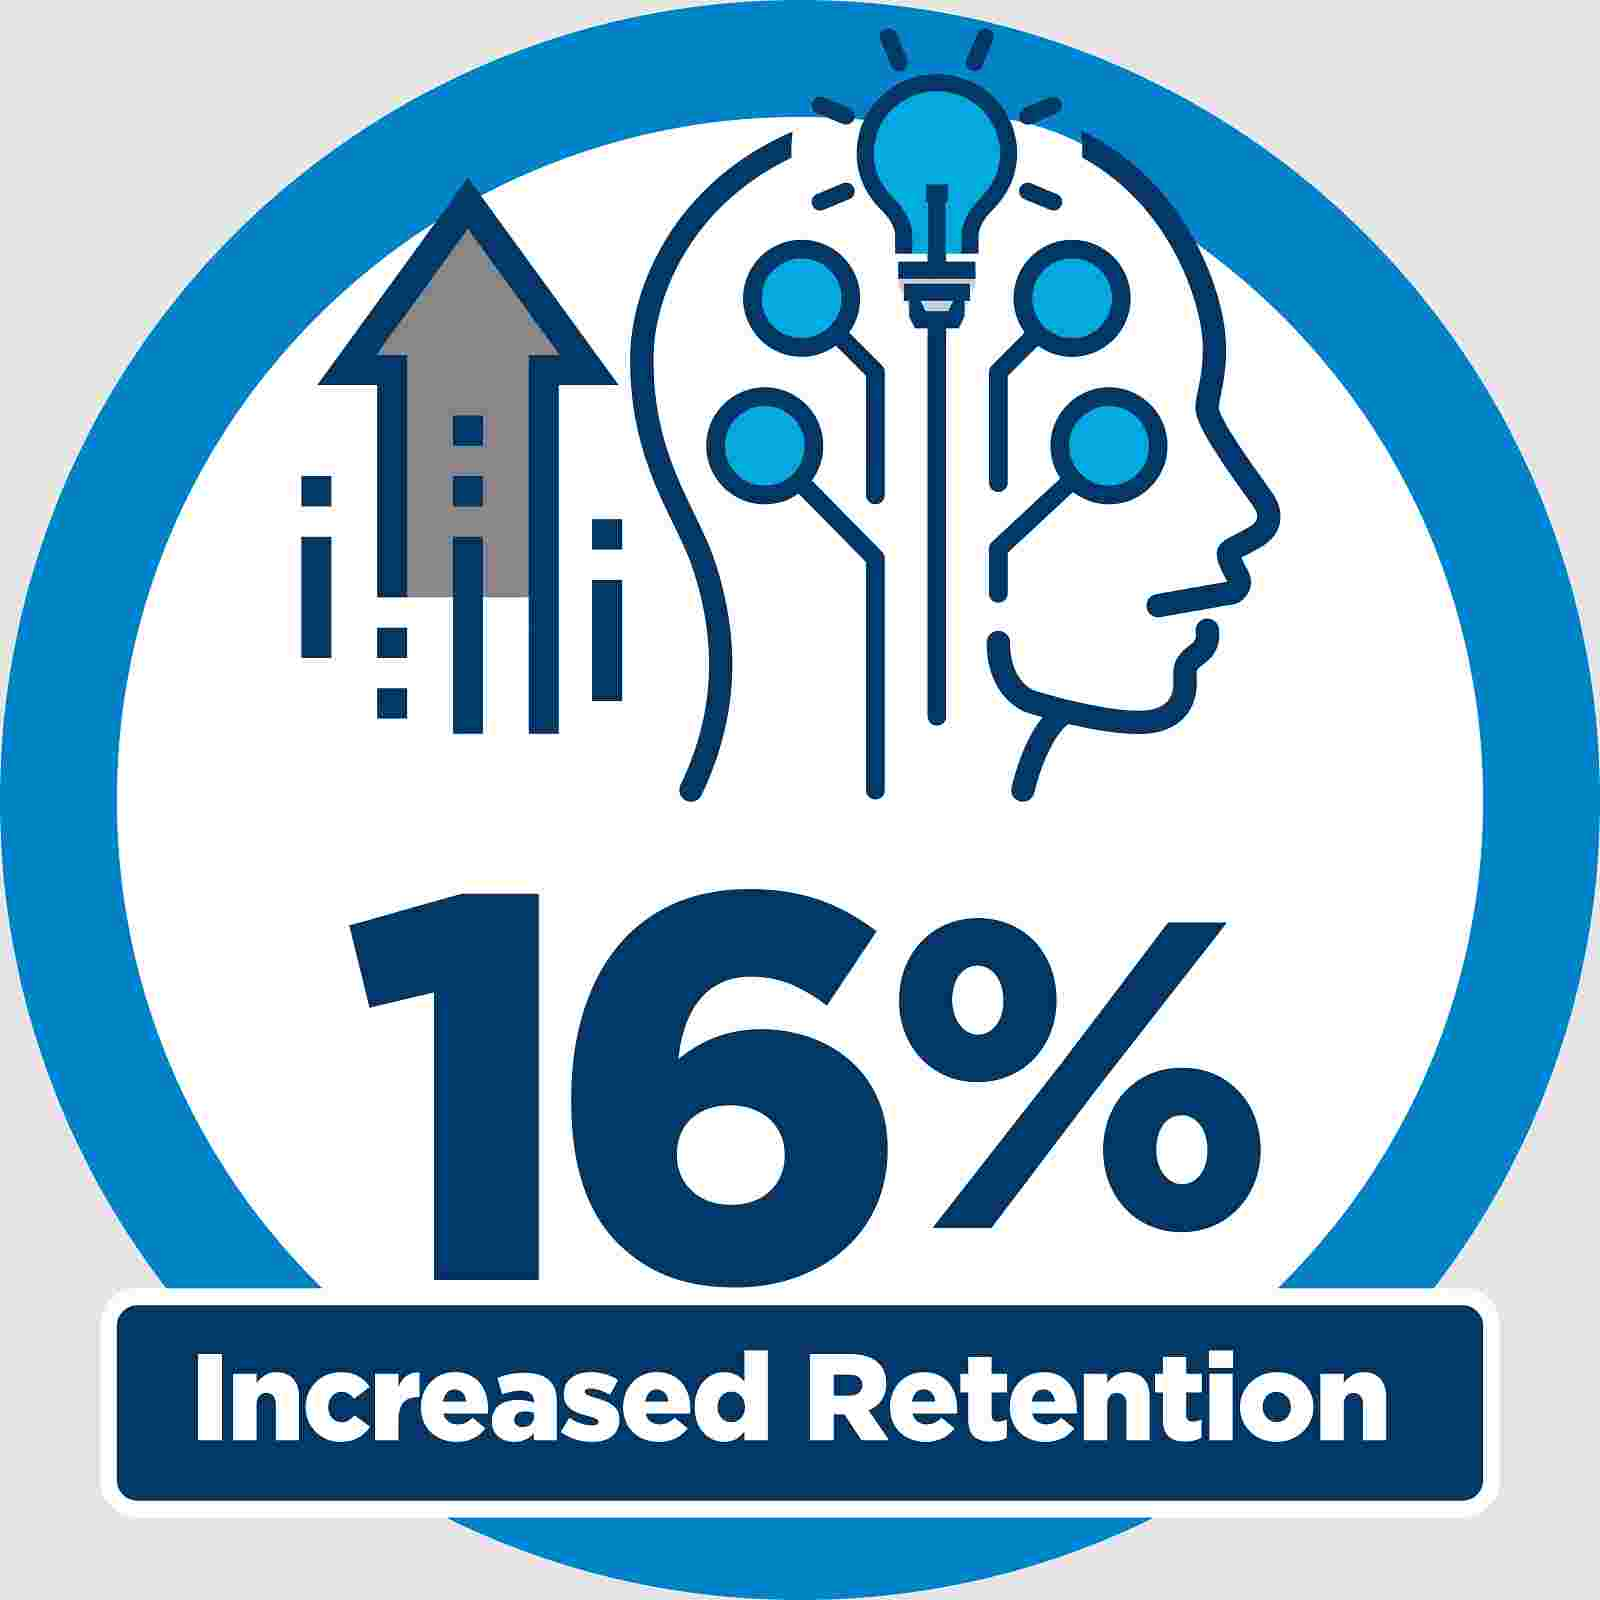 16% Increased Retention